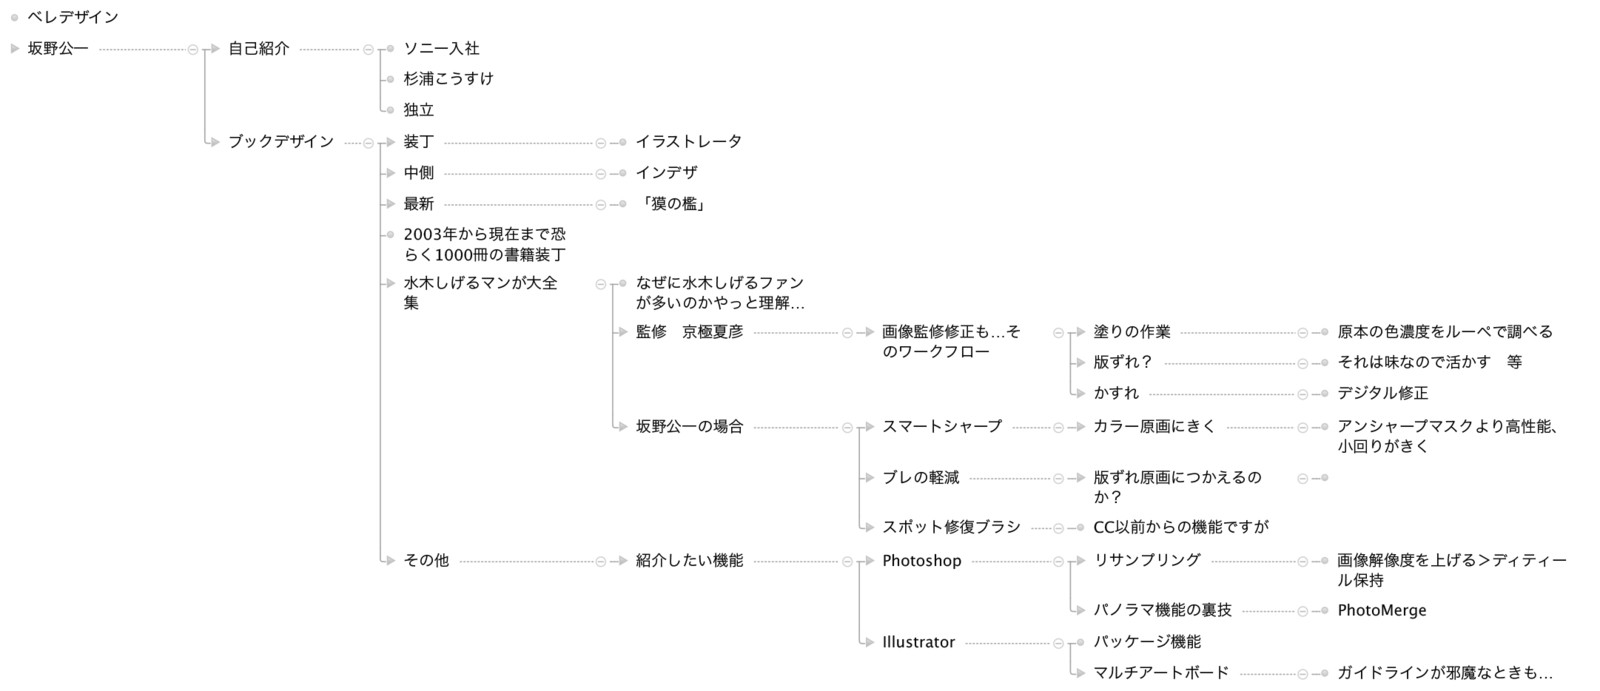 Sakanosann_rtree